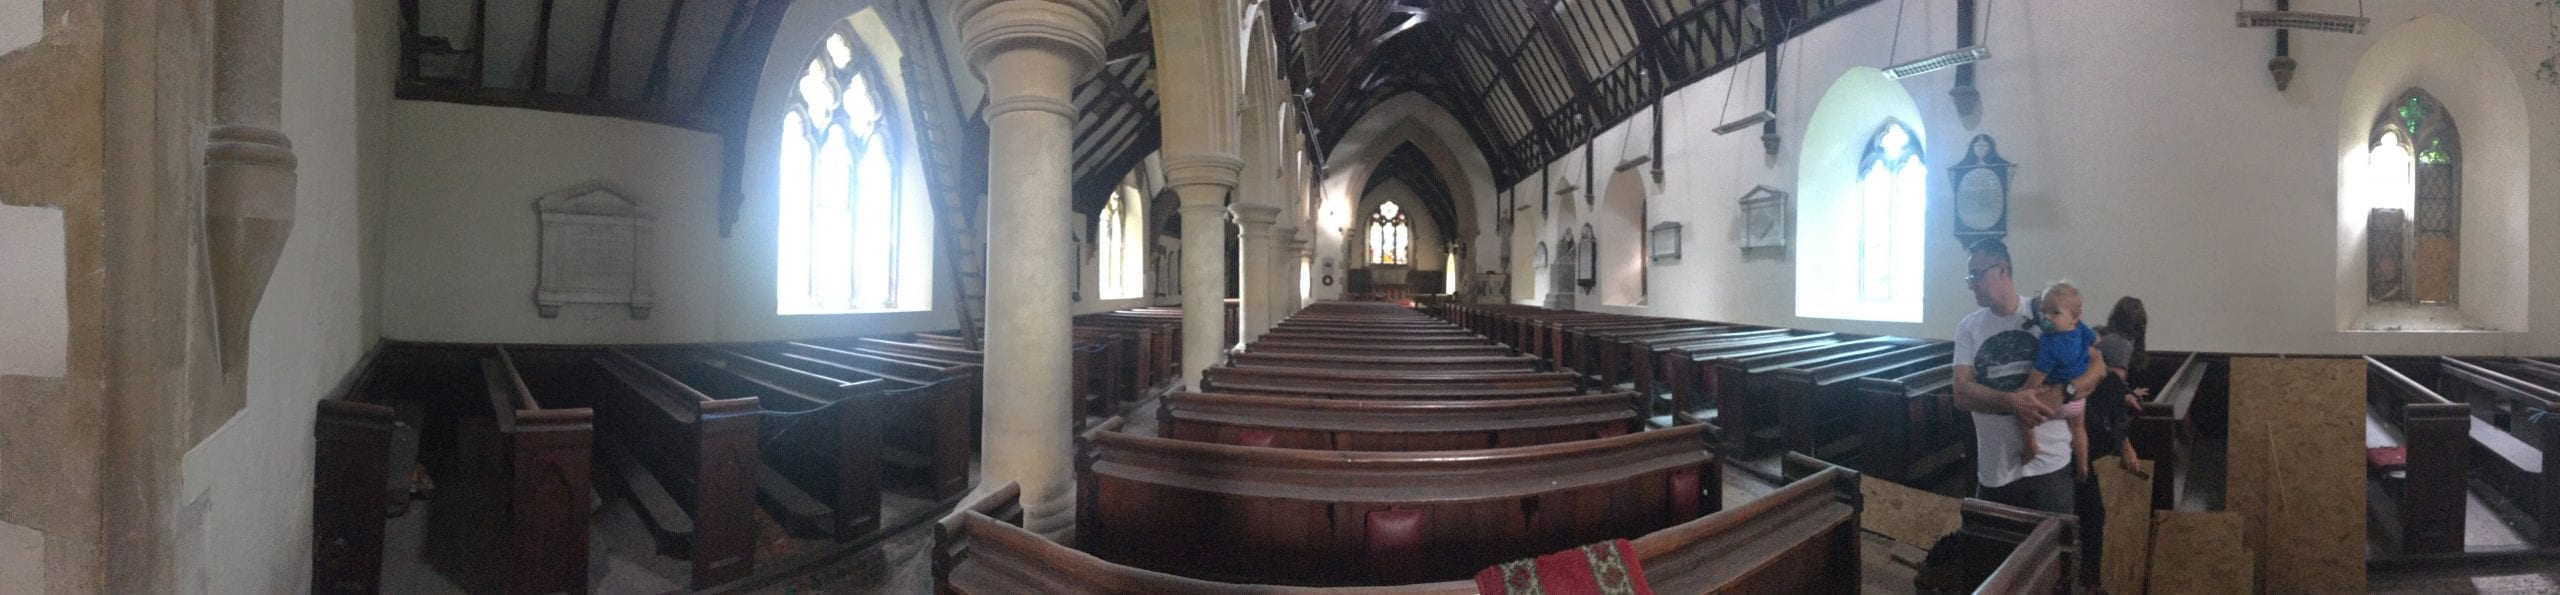 Haverfordwest church